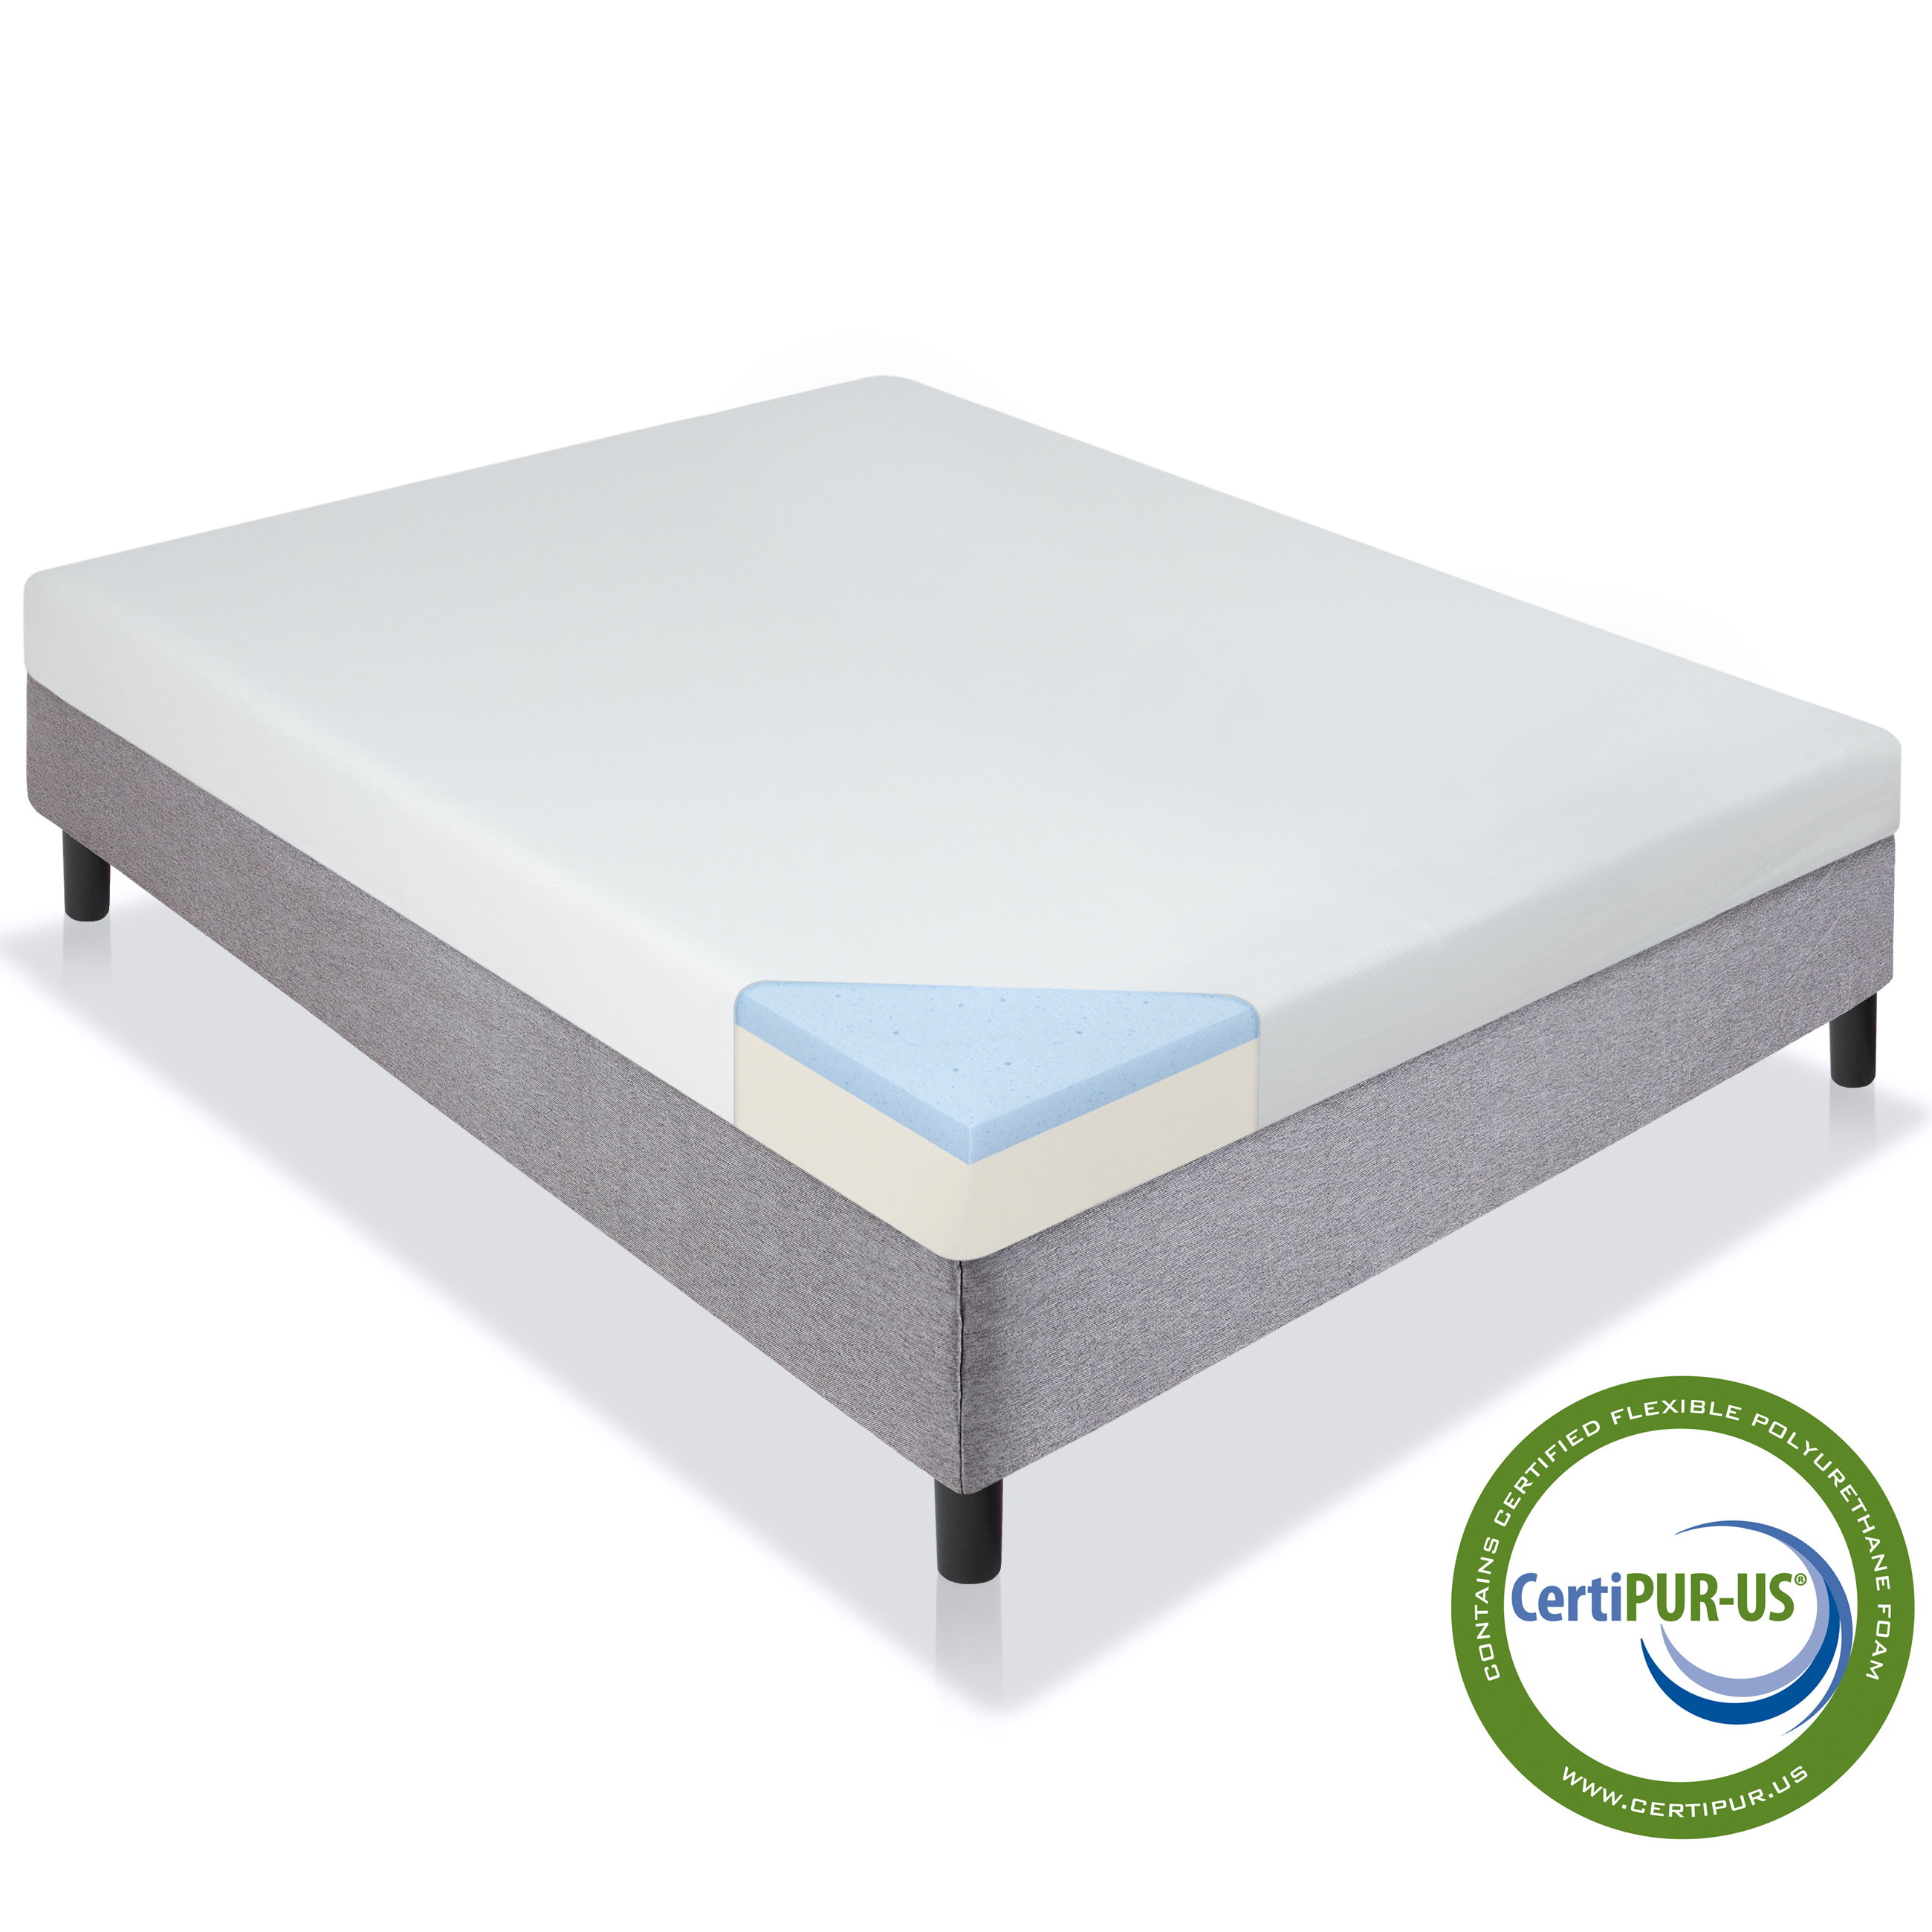 Best Choice Products 5in Full Size Dual Layered Gel Memory Foam Mattress w/ CertiPUR-US Certified Foam